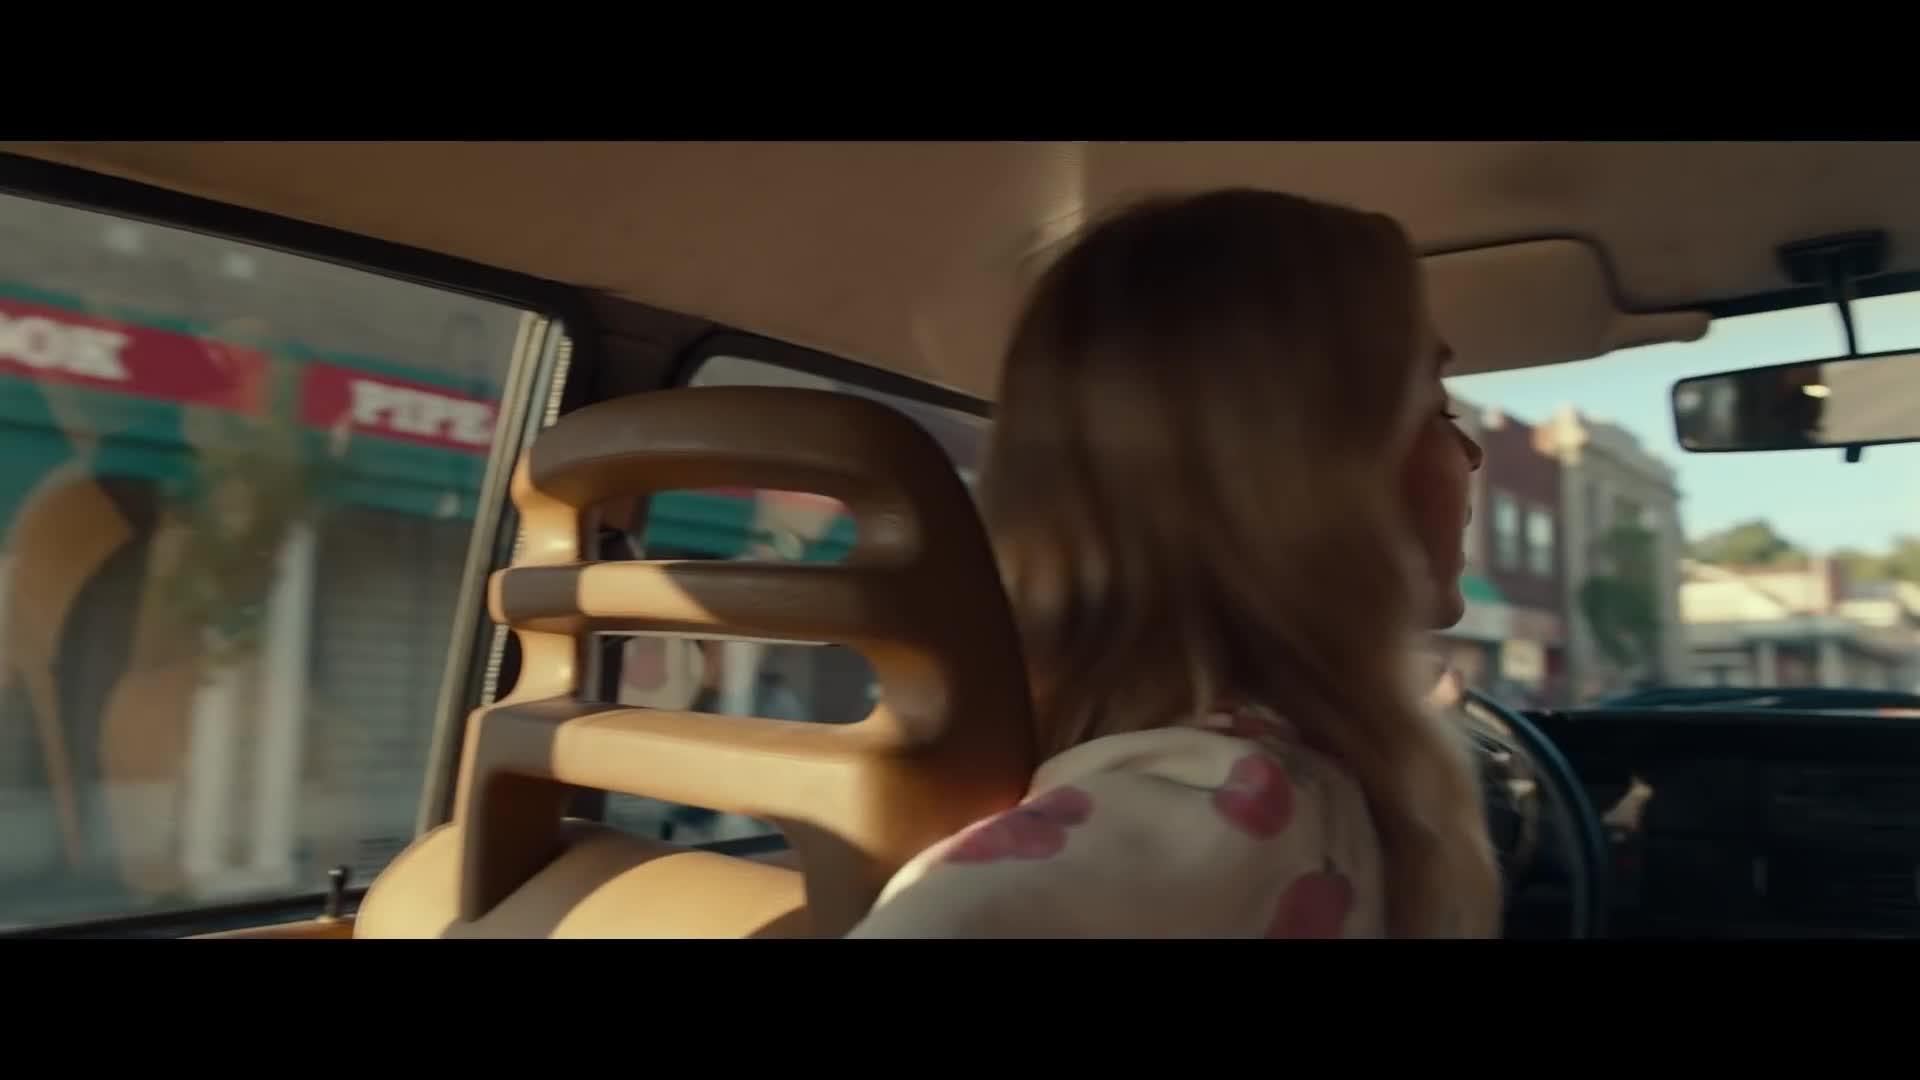 A Quiet Place Part II - Official Trailer #1 [HD] screen capture